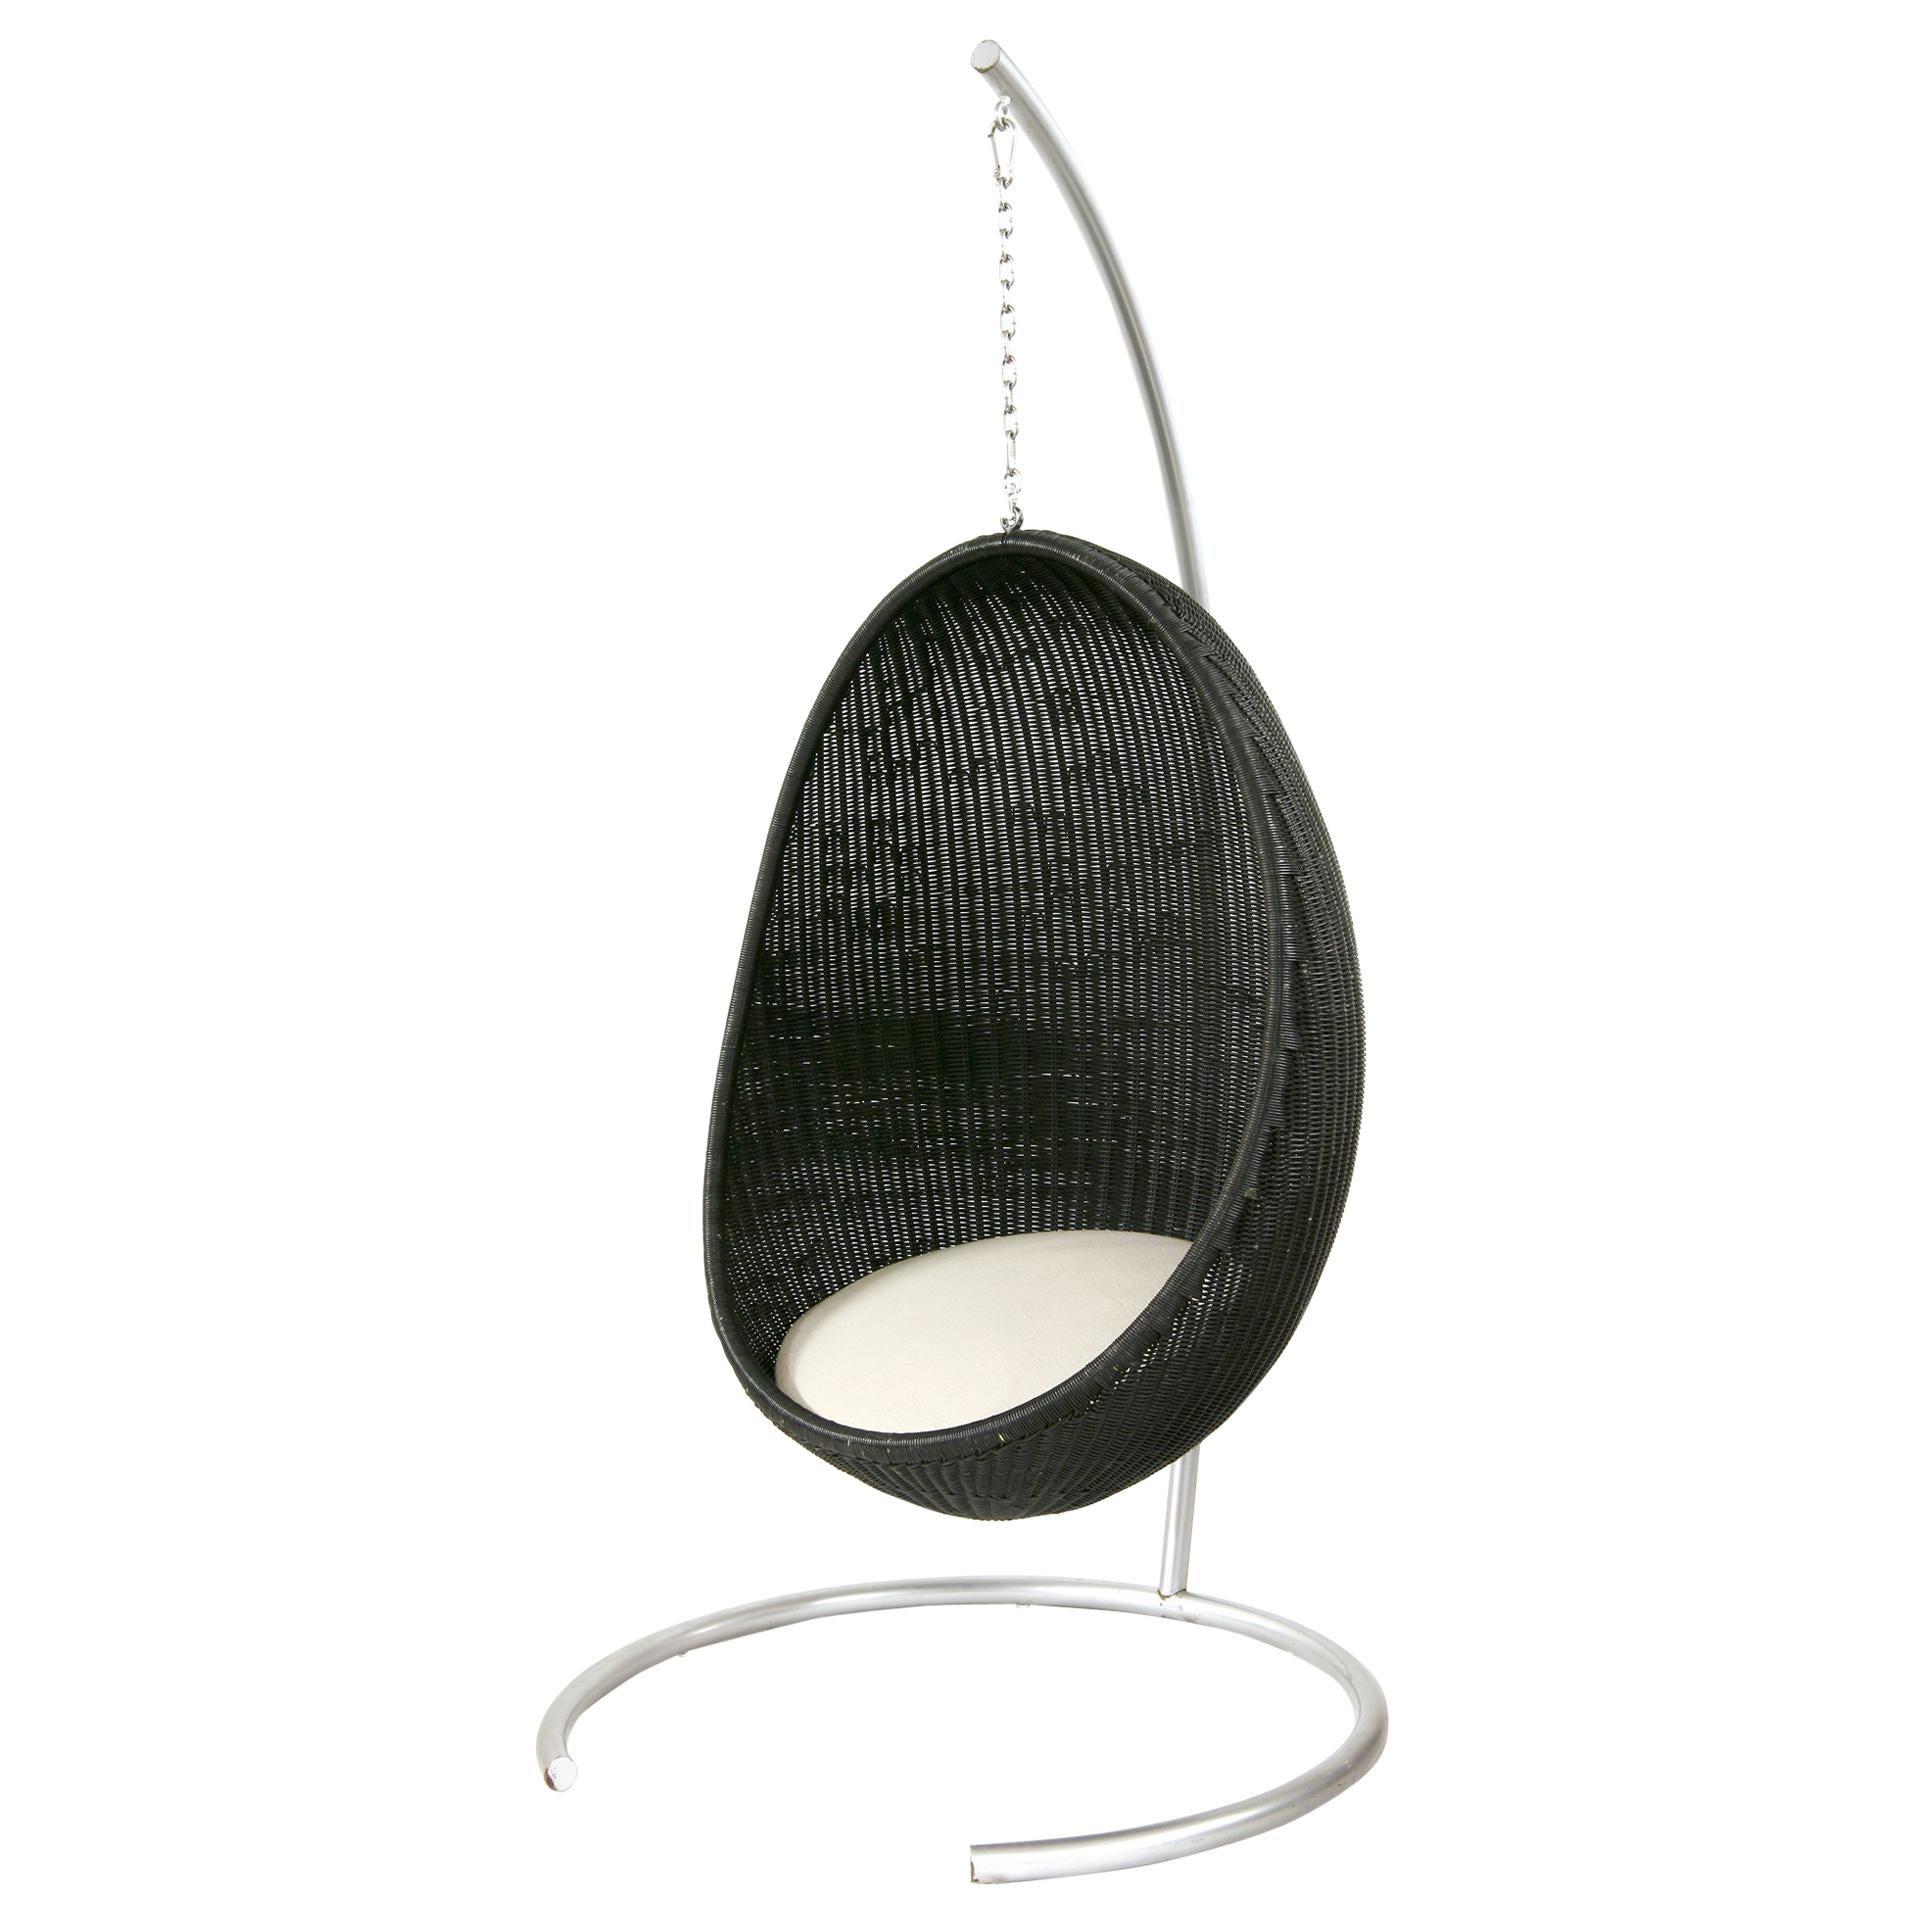 1950s Nanna & Jorgen Ditzel Design Hanging Outdoor Black Egg Chair